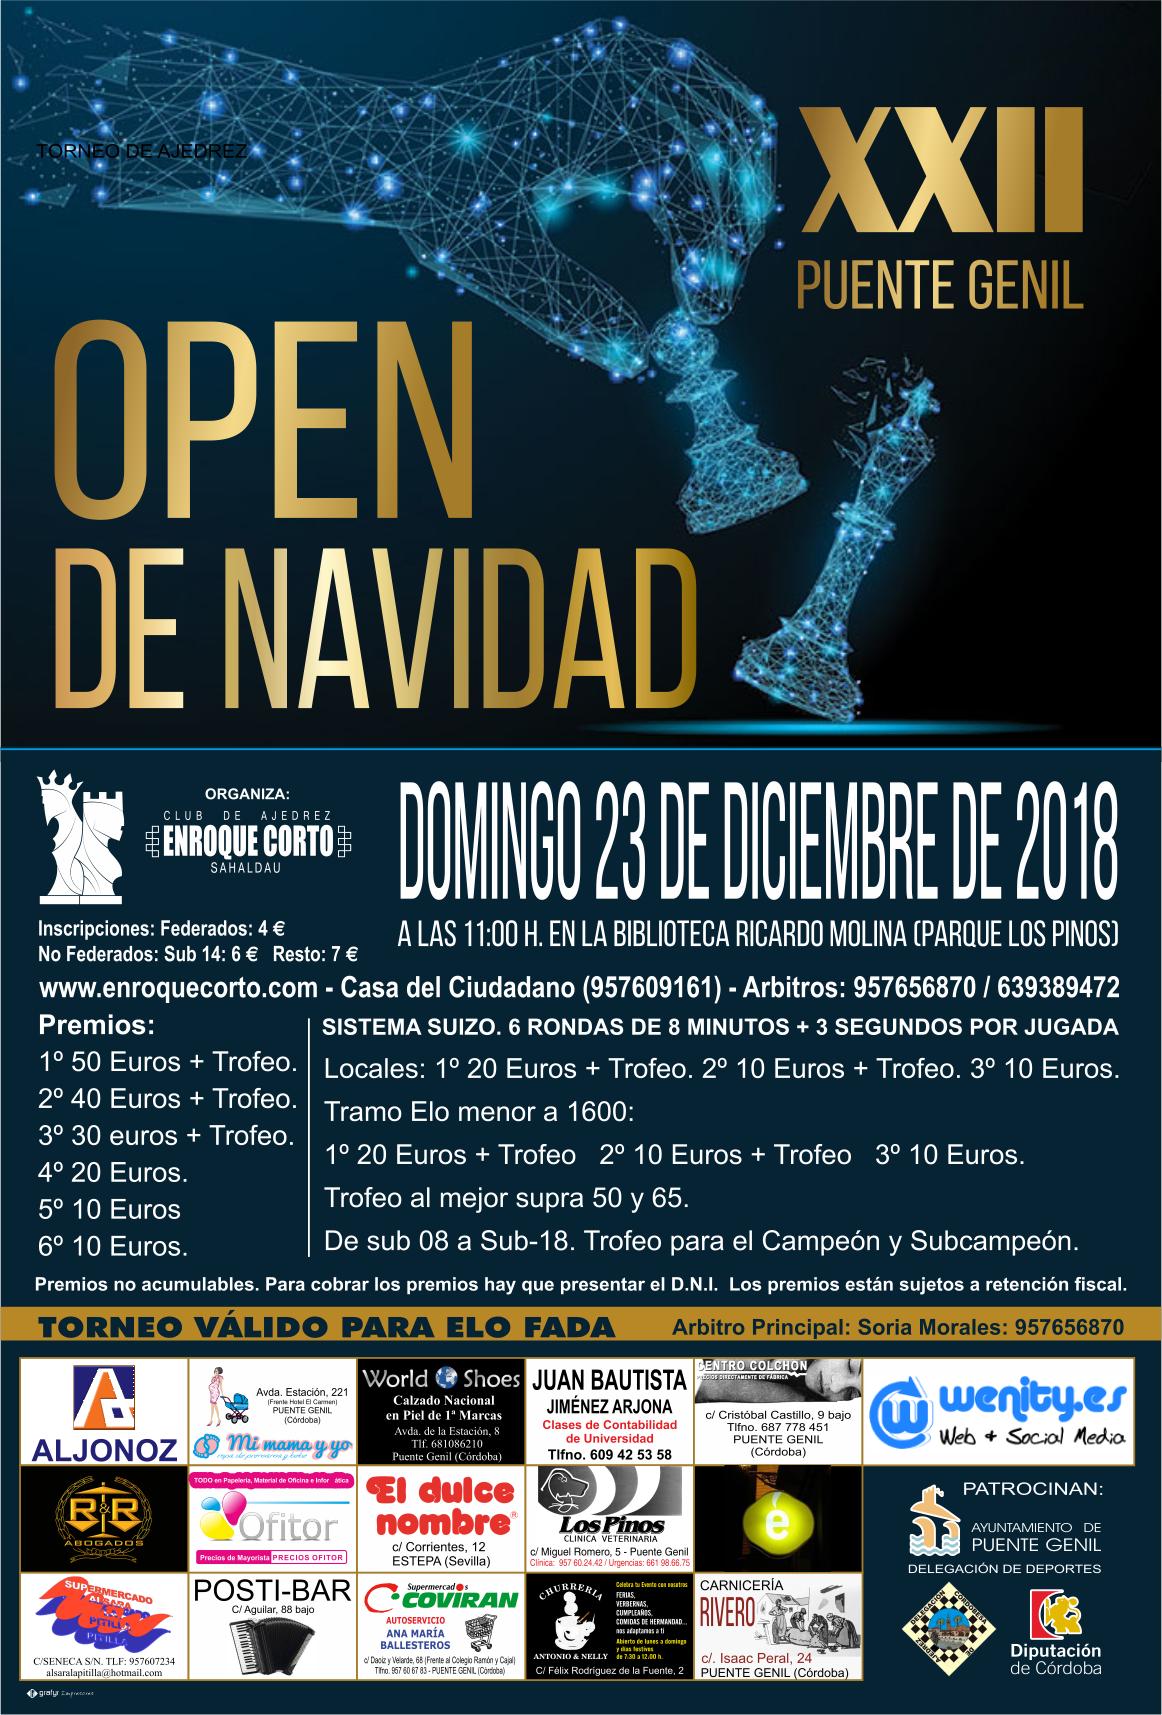 Torneo Ajedrez Navidad Puente Genil 2018